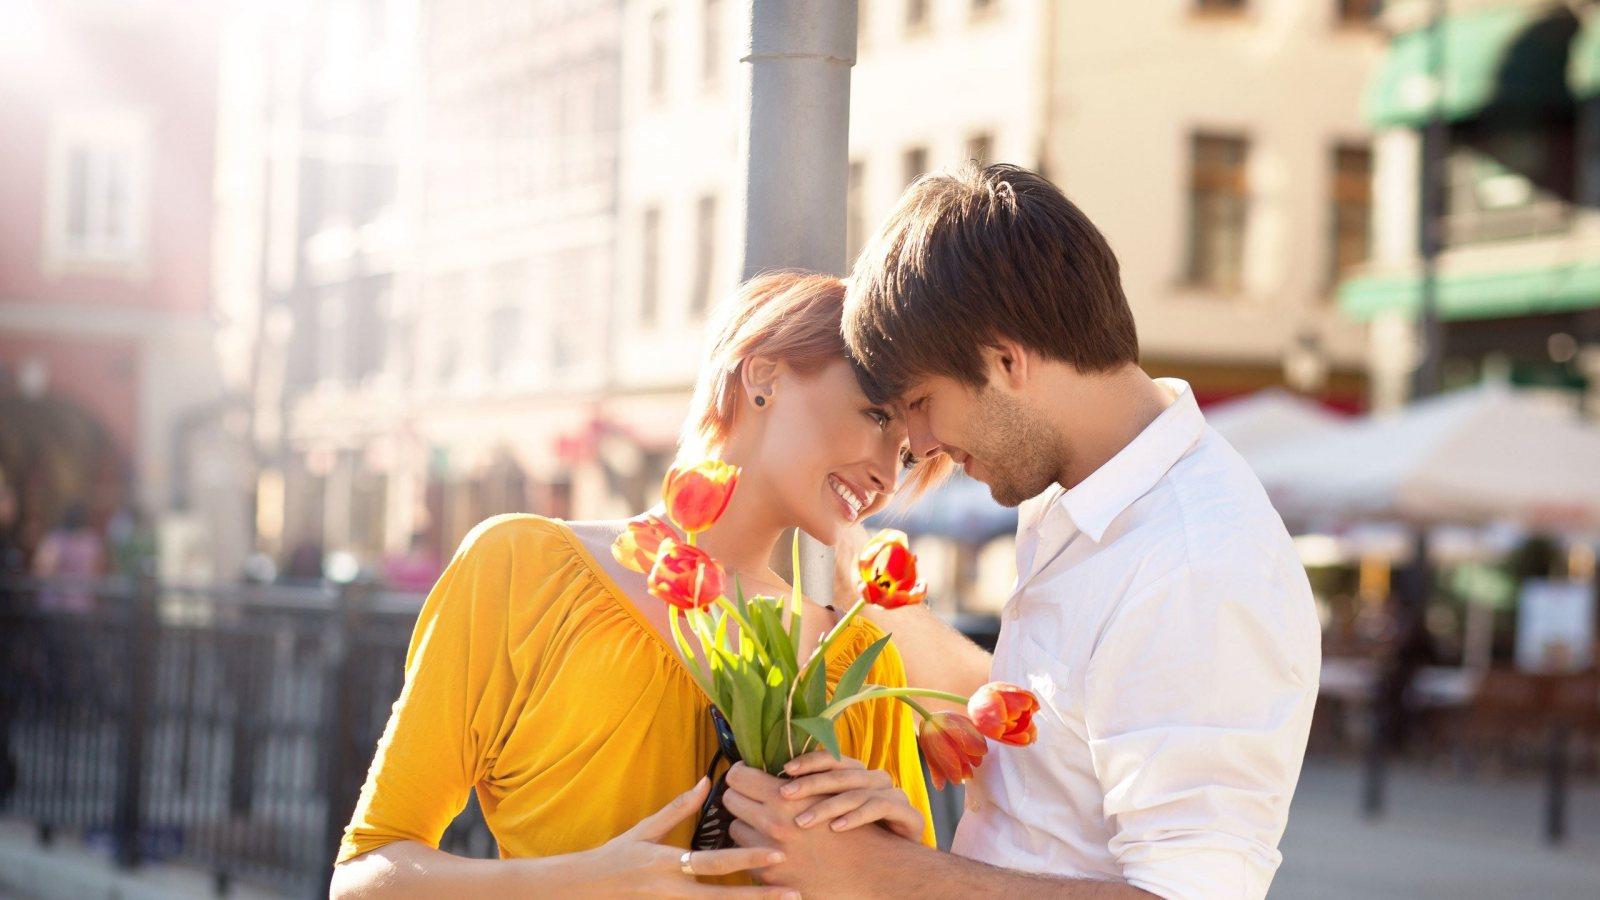 Anunturi matrimoniale femei singure – cum sa-ti gasesti jumatatea online